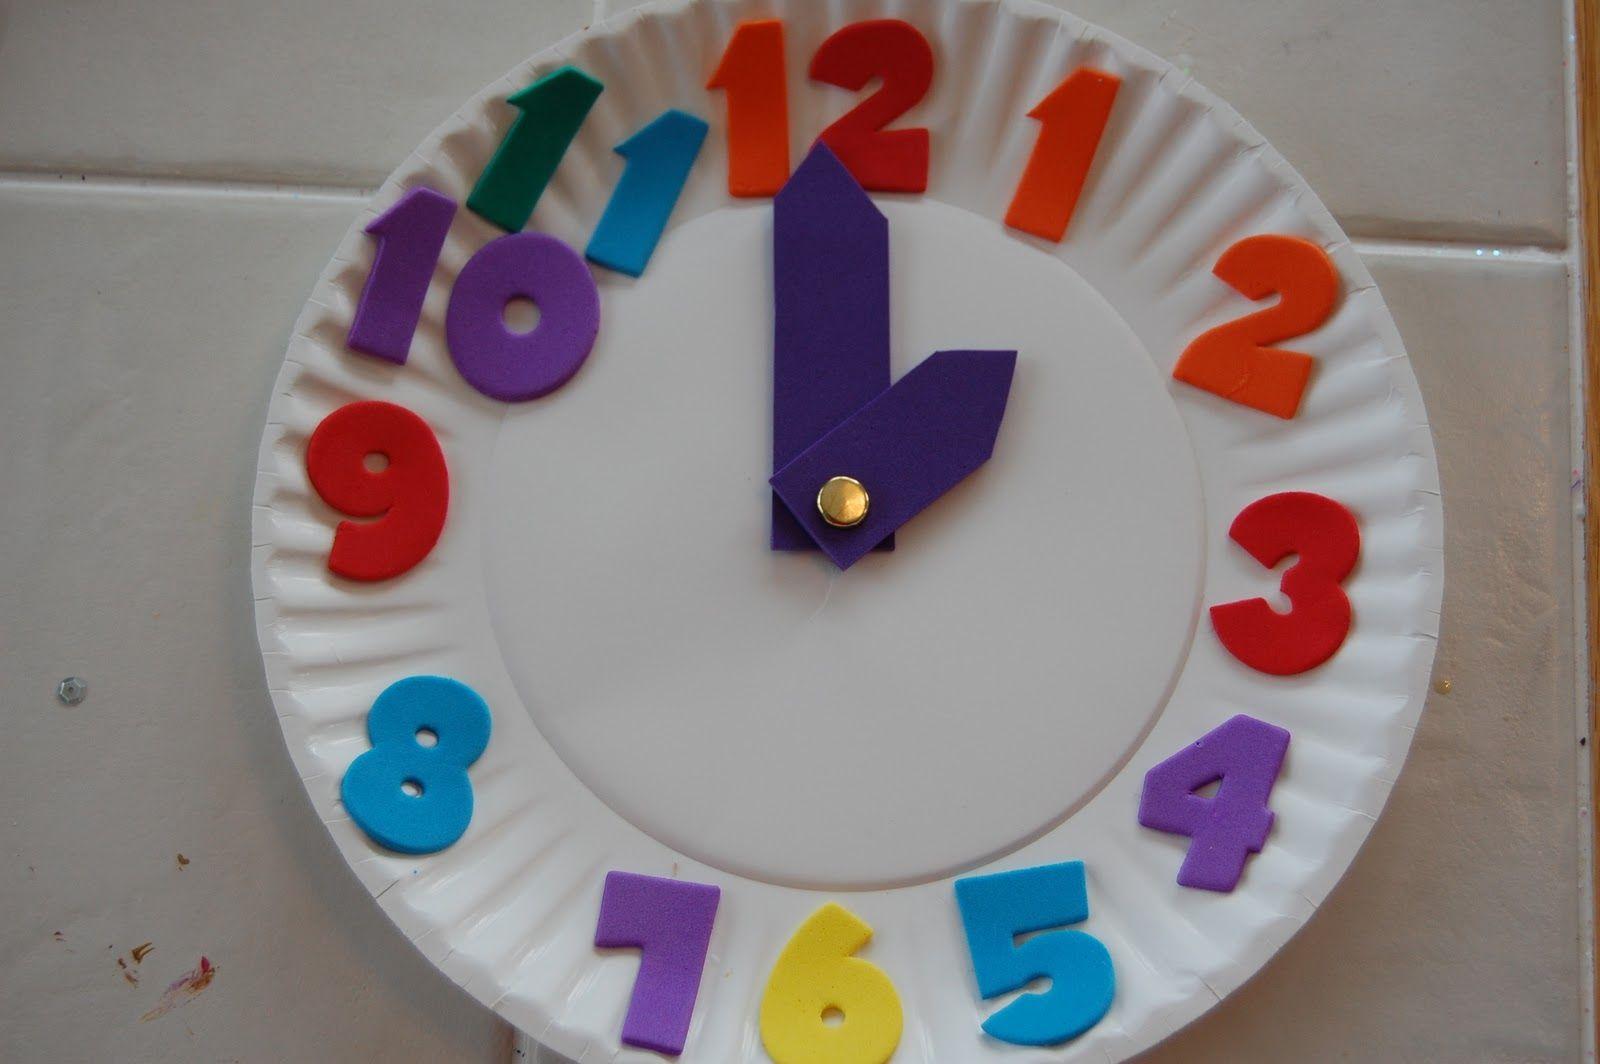 Countdown clock till midnight New year's crafts, New